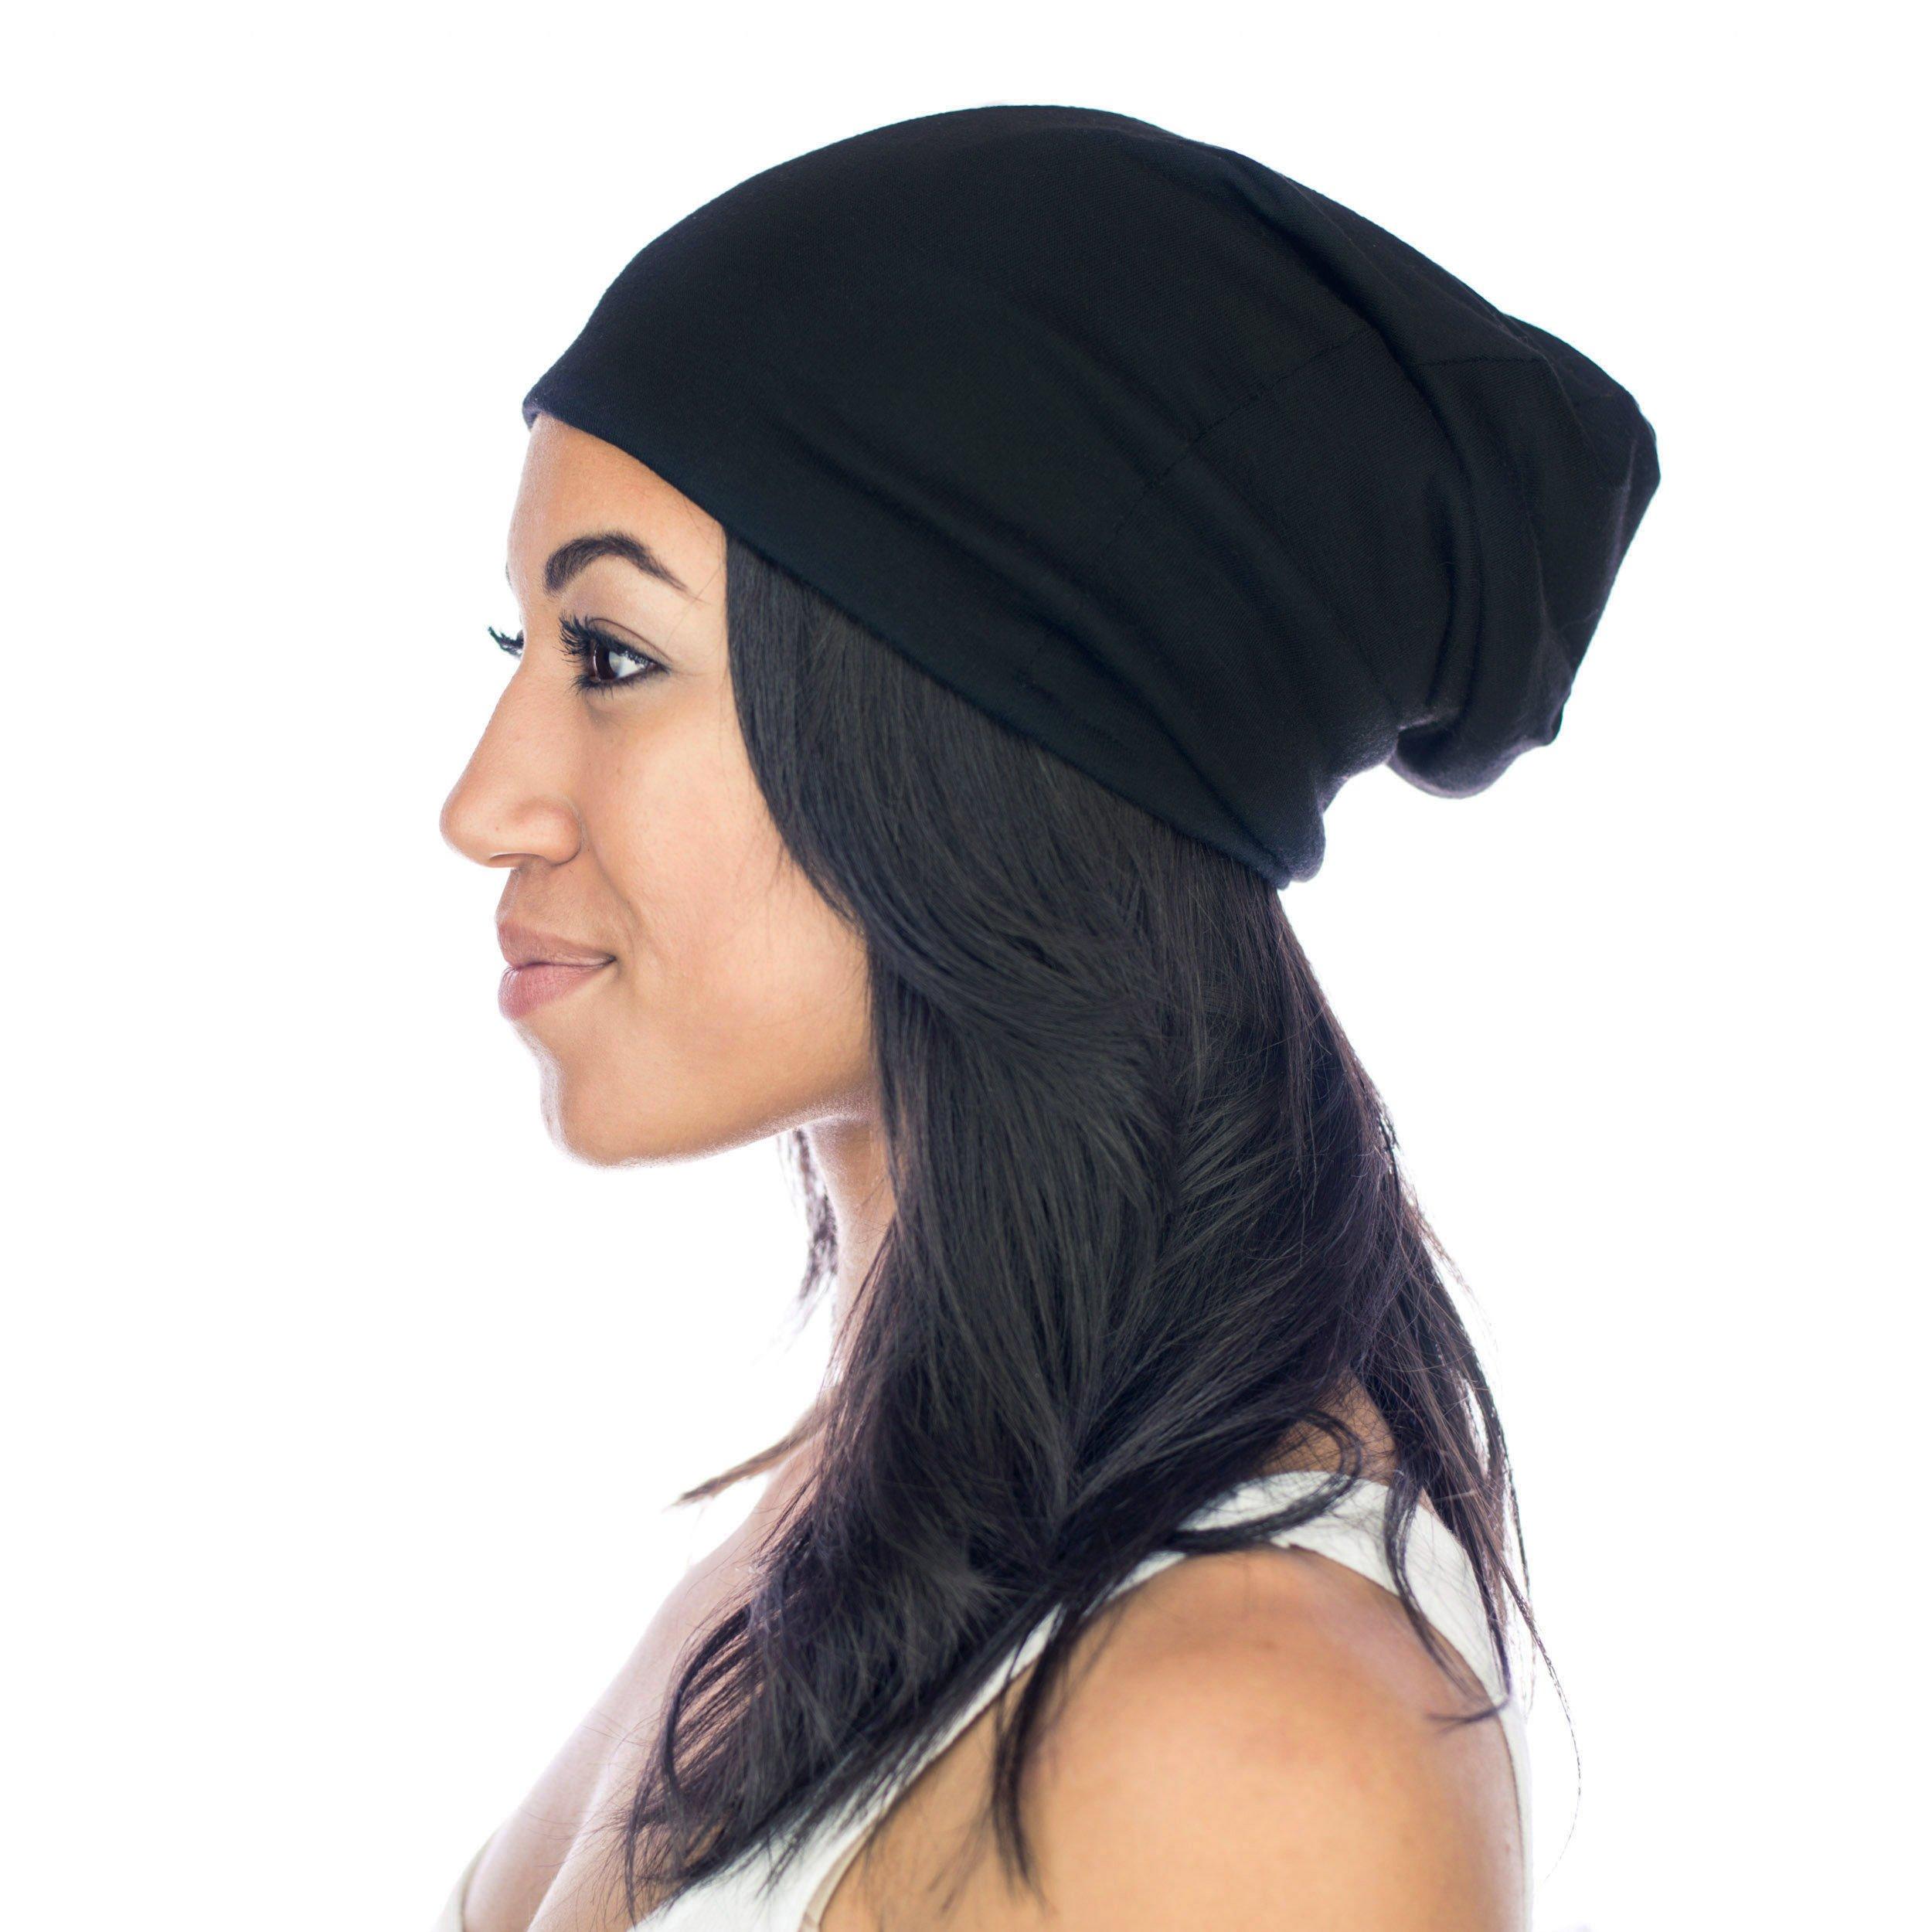 Grace Eleyae [Slap Satin-Lined Sleep Cap, Women's Tam Hat Beanie - Large, Black